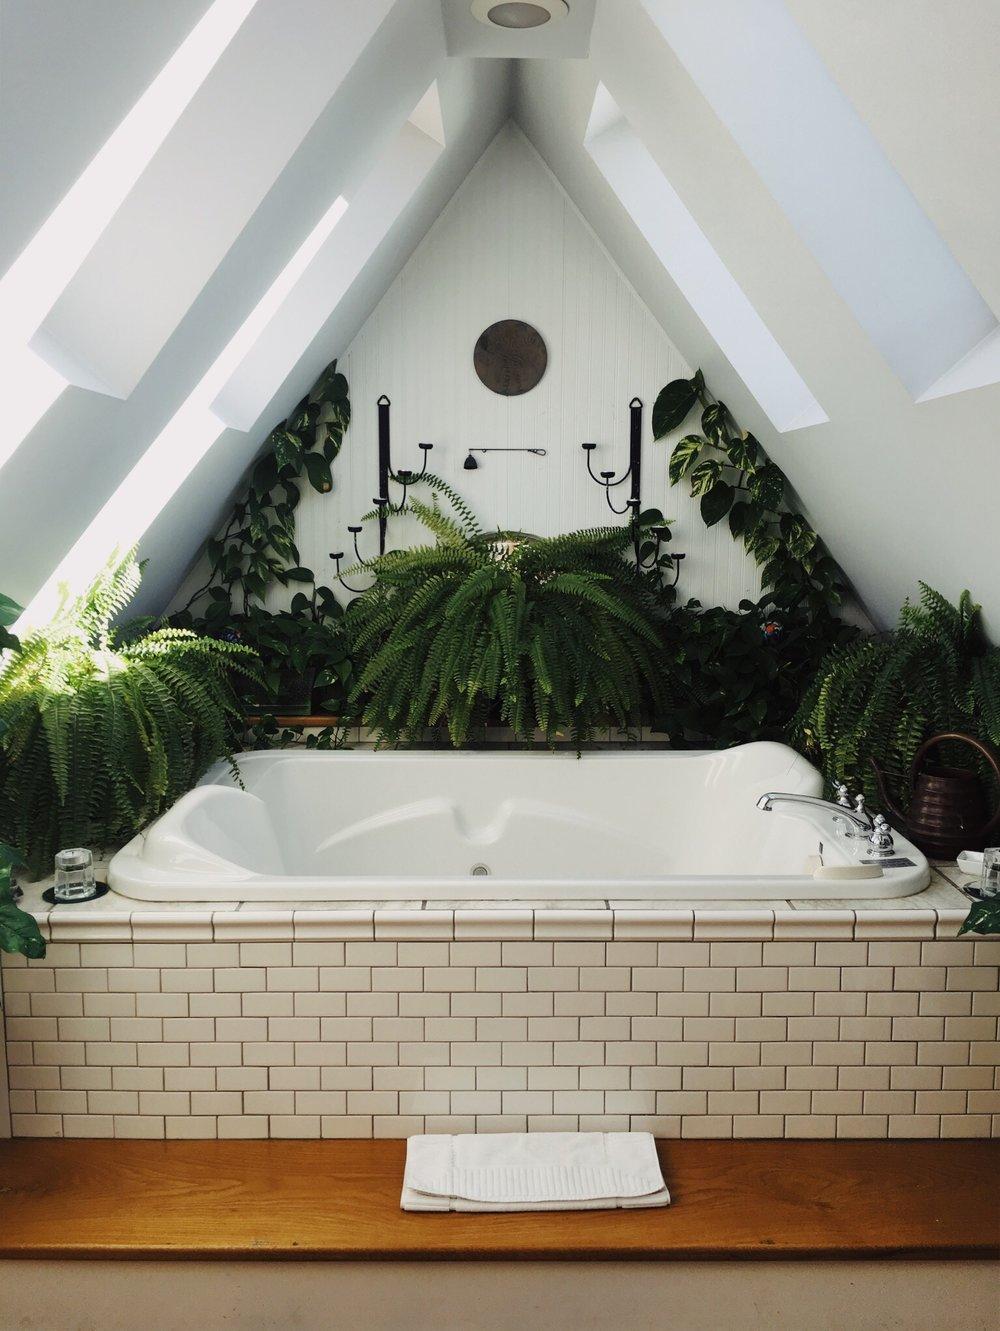 Bathroom renovation company London